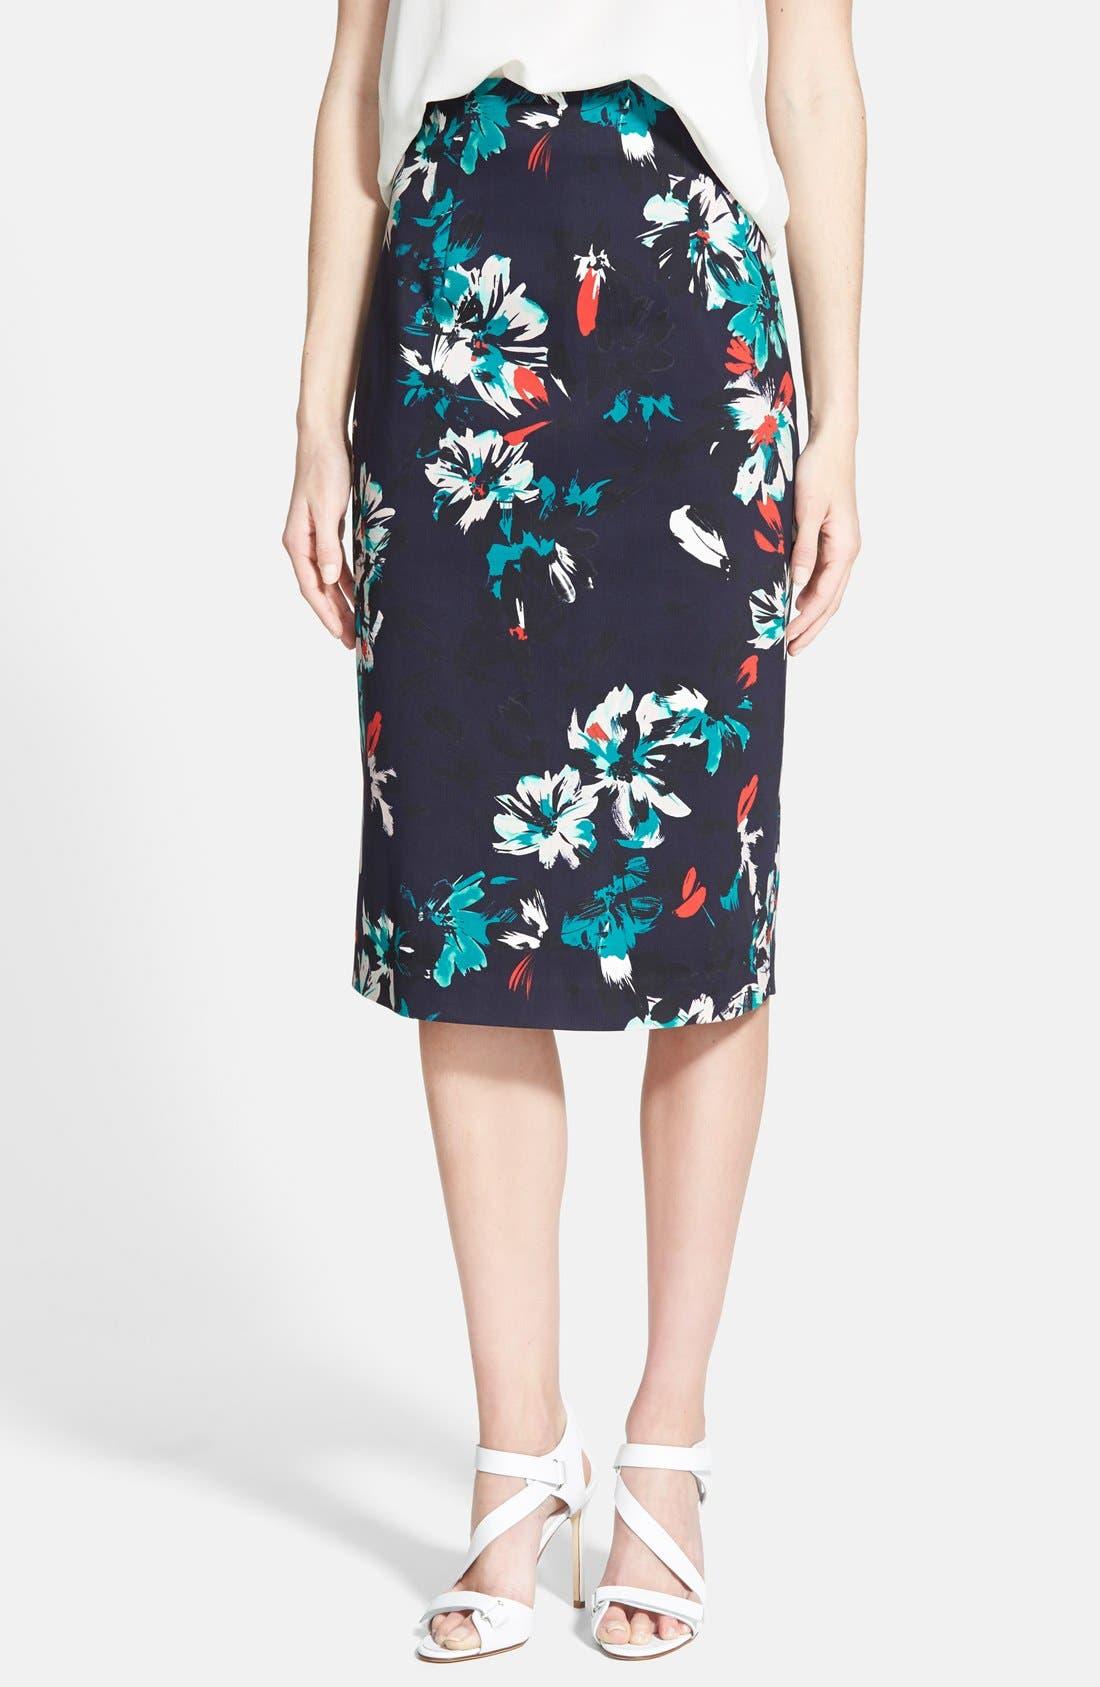 Main Image - Chelsea28 High Waist Floral Pencil Skirt